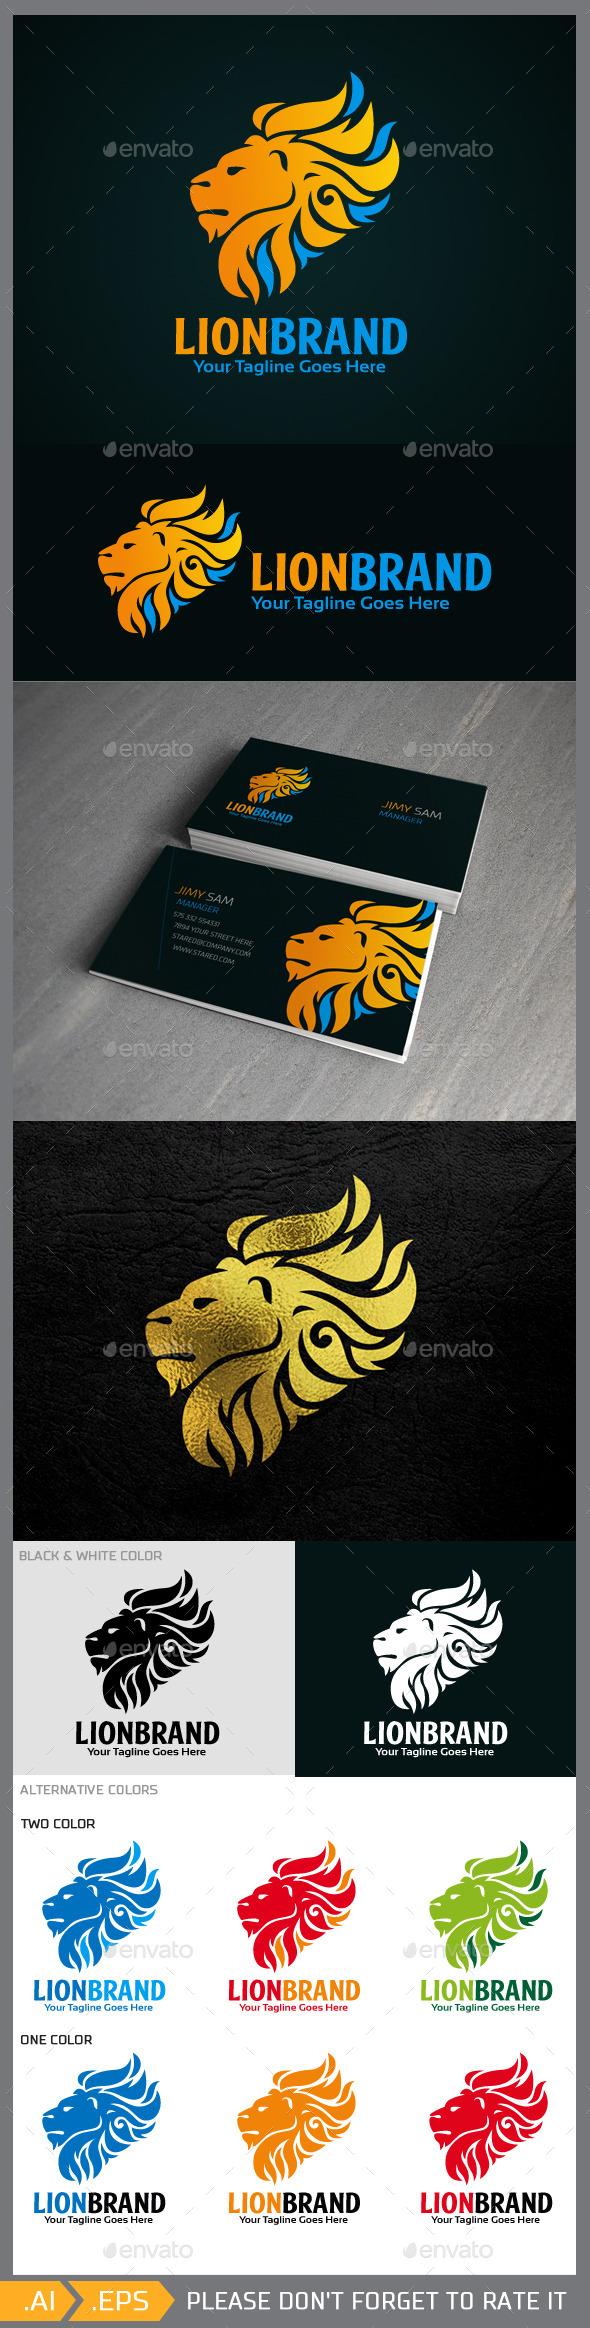 Lionbrand Logo Template - Animals Logo Templates